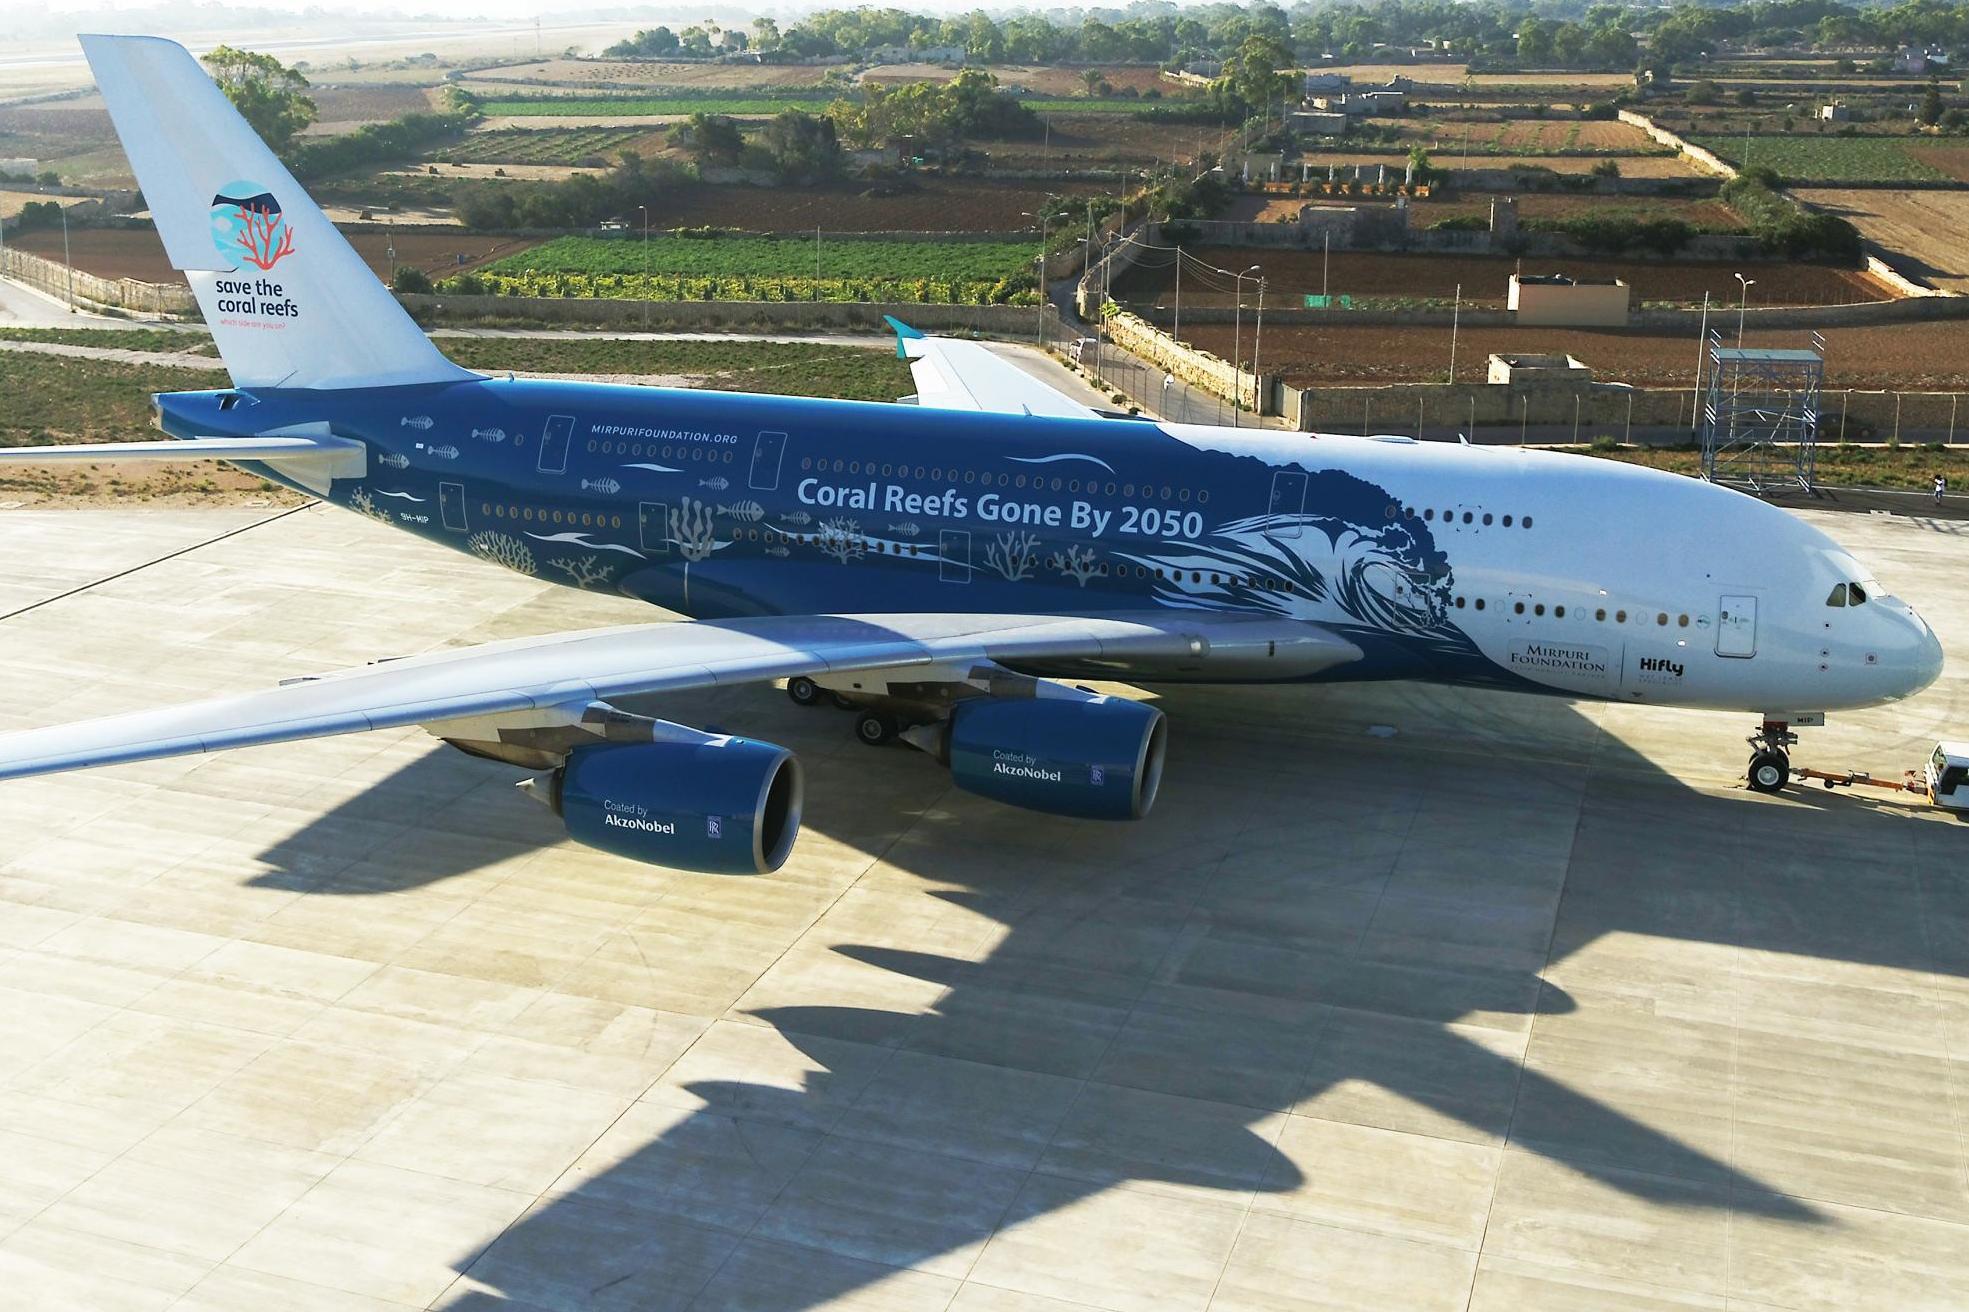 A380 flight: World's biggest passenger plane finally flies from London to New York City